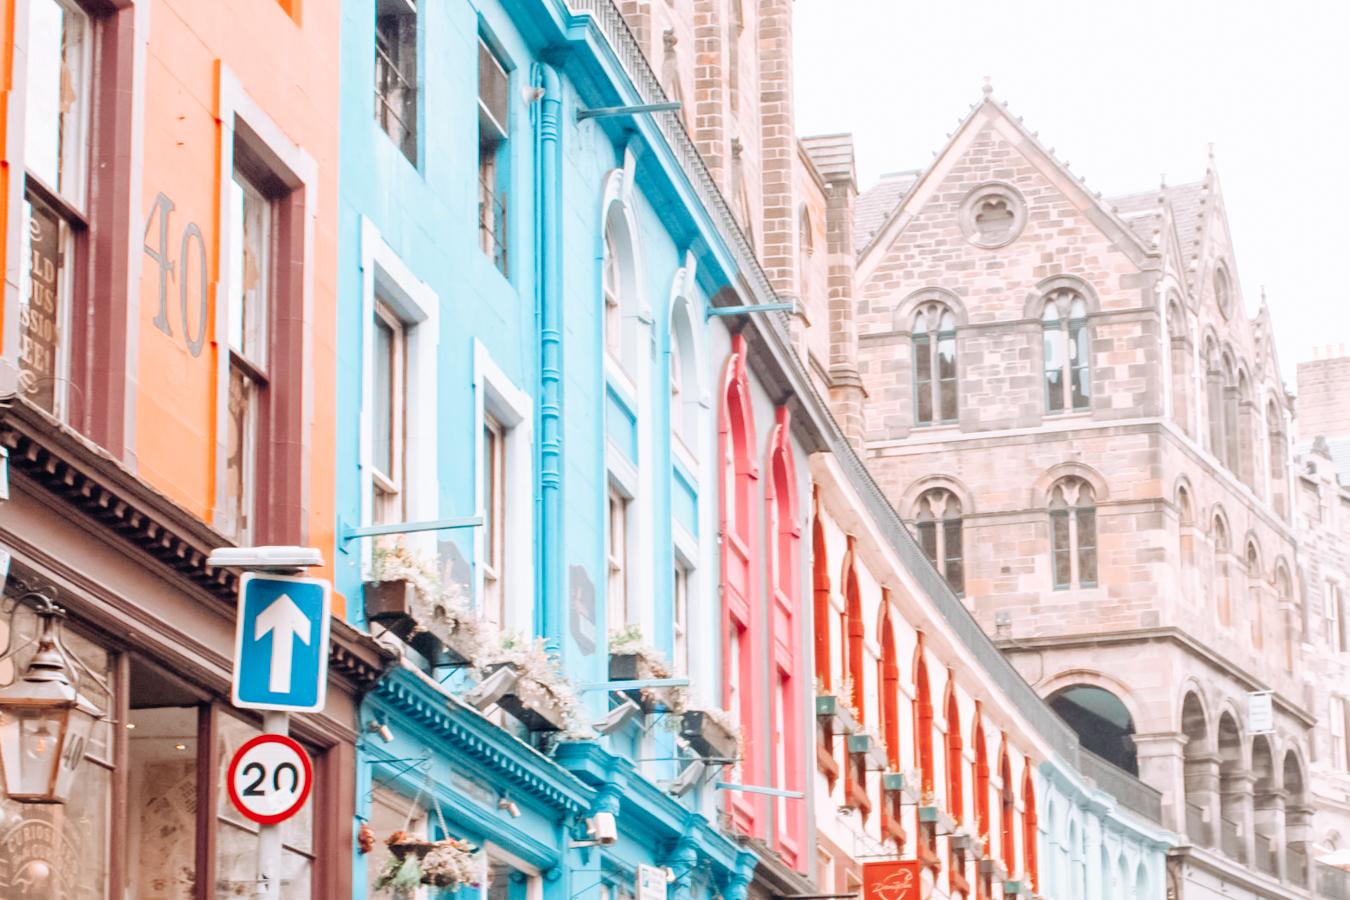 Colorful buildings in Edinburgh